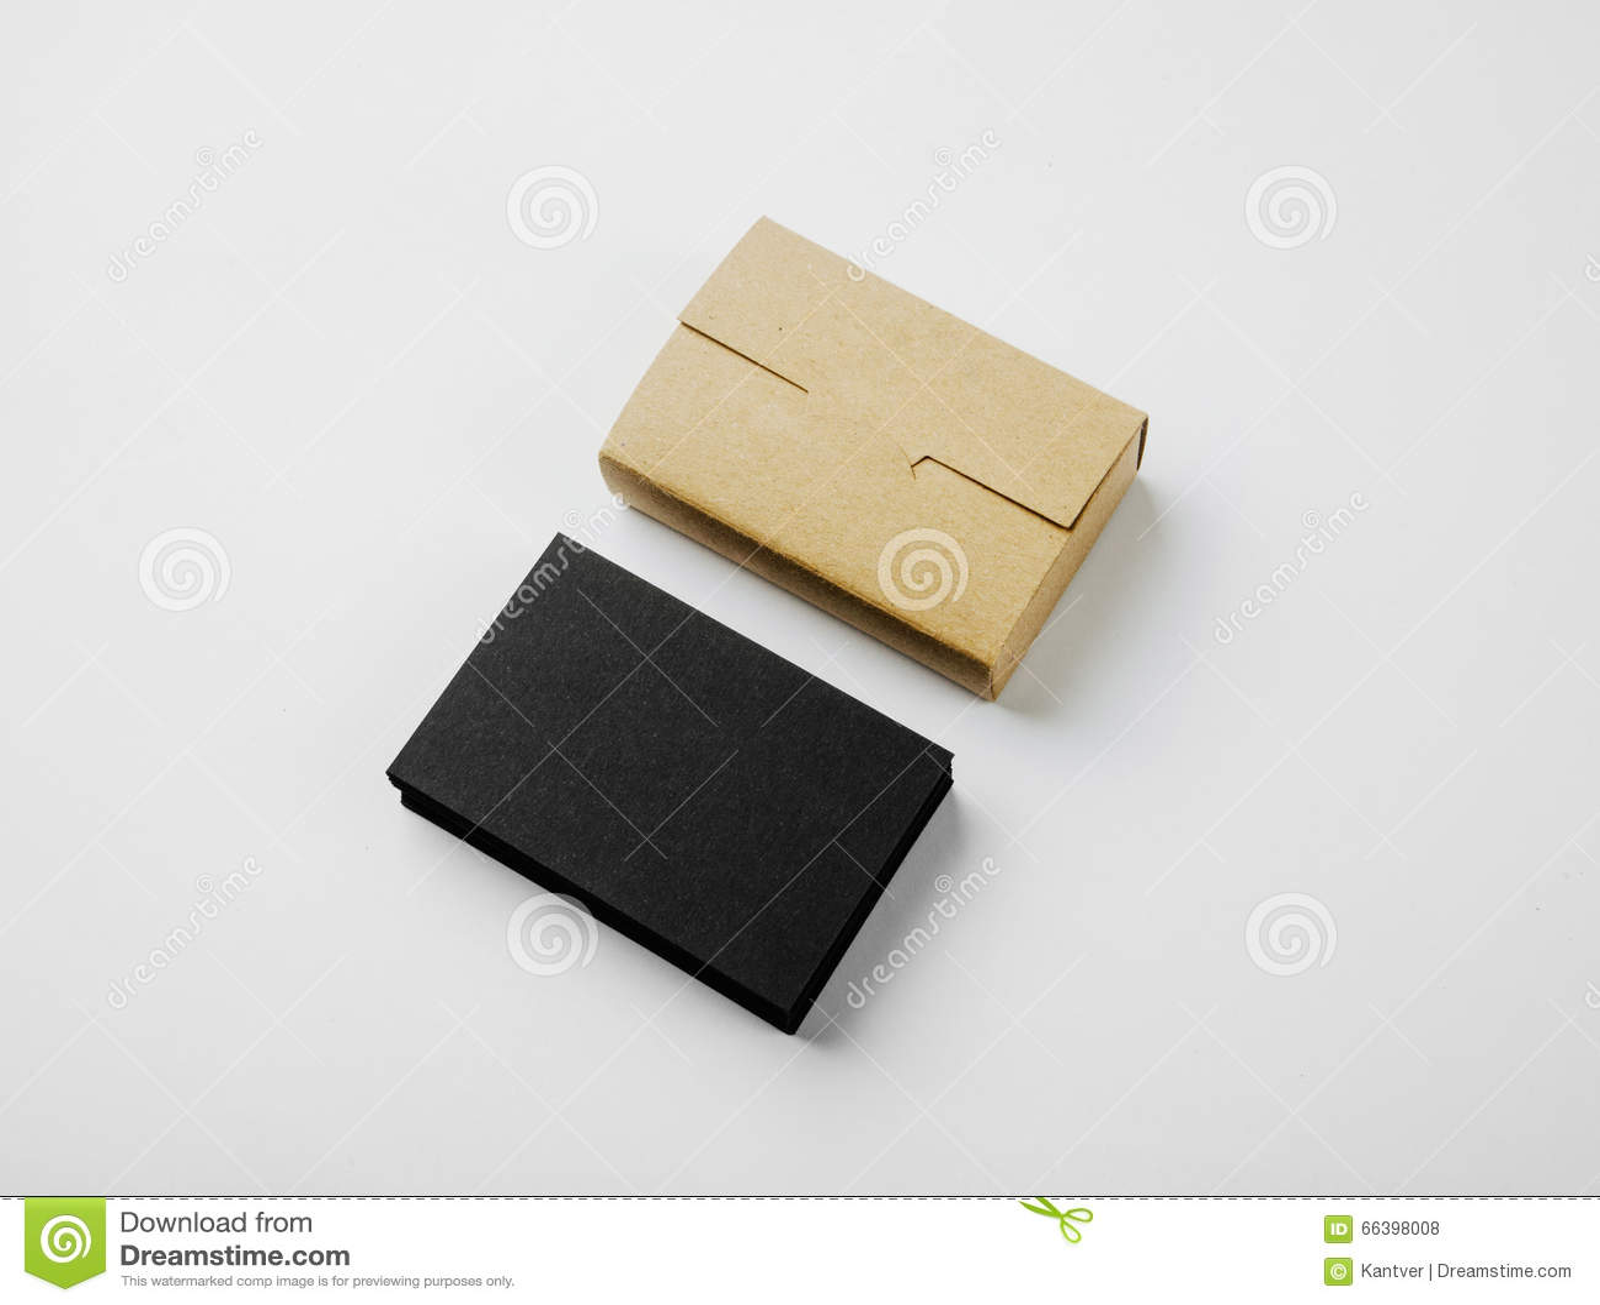 Blank photo card stock Cards Card Stock Shop m